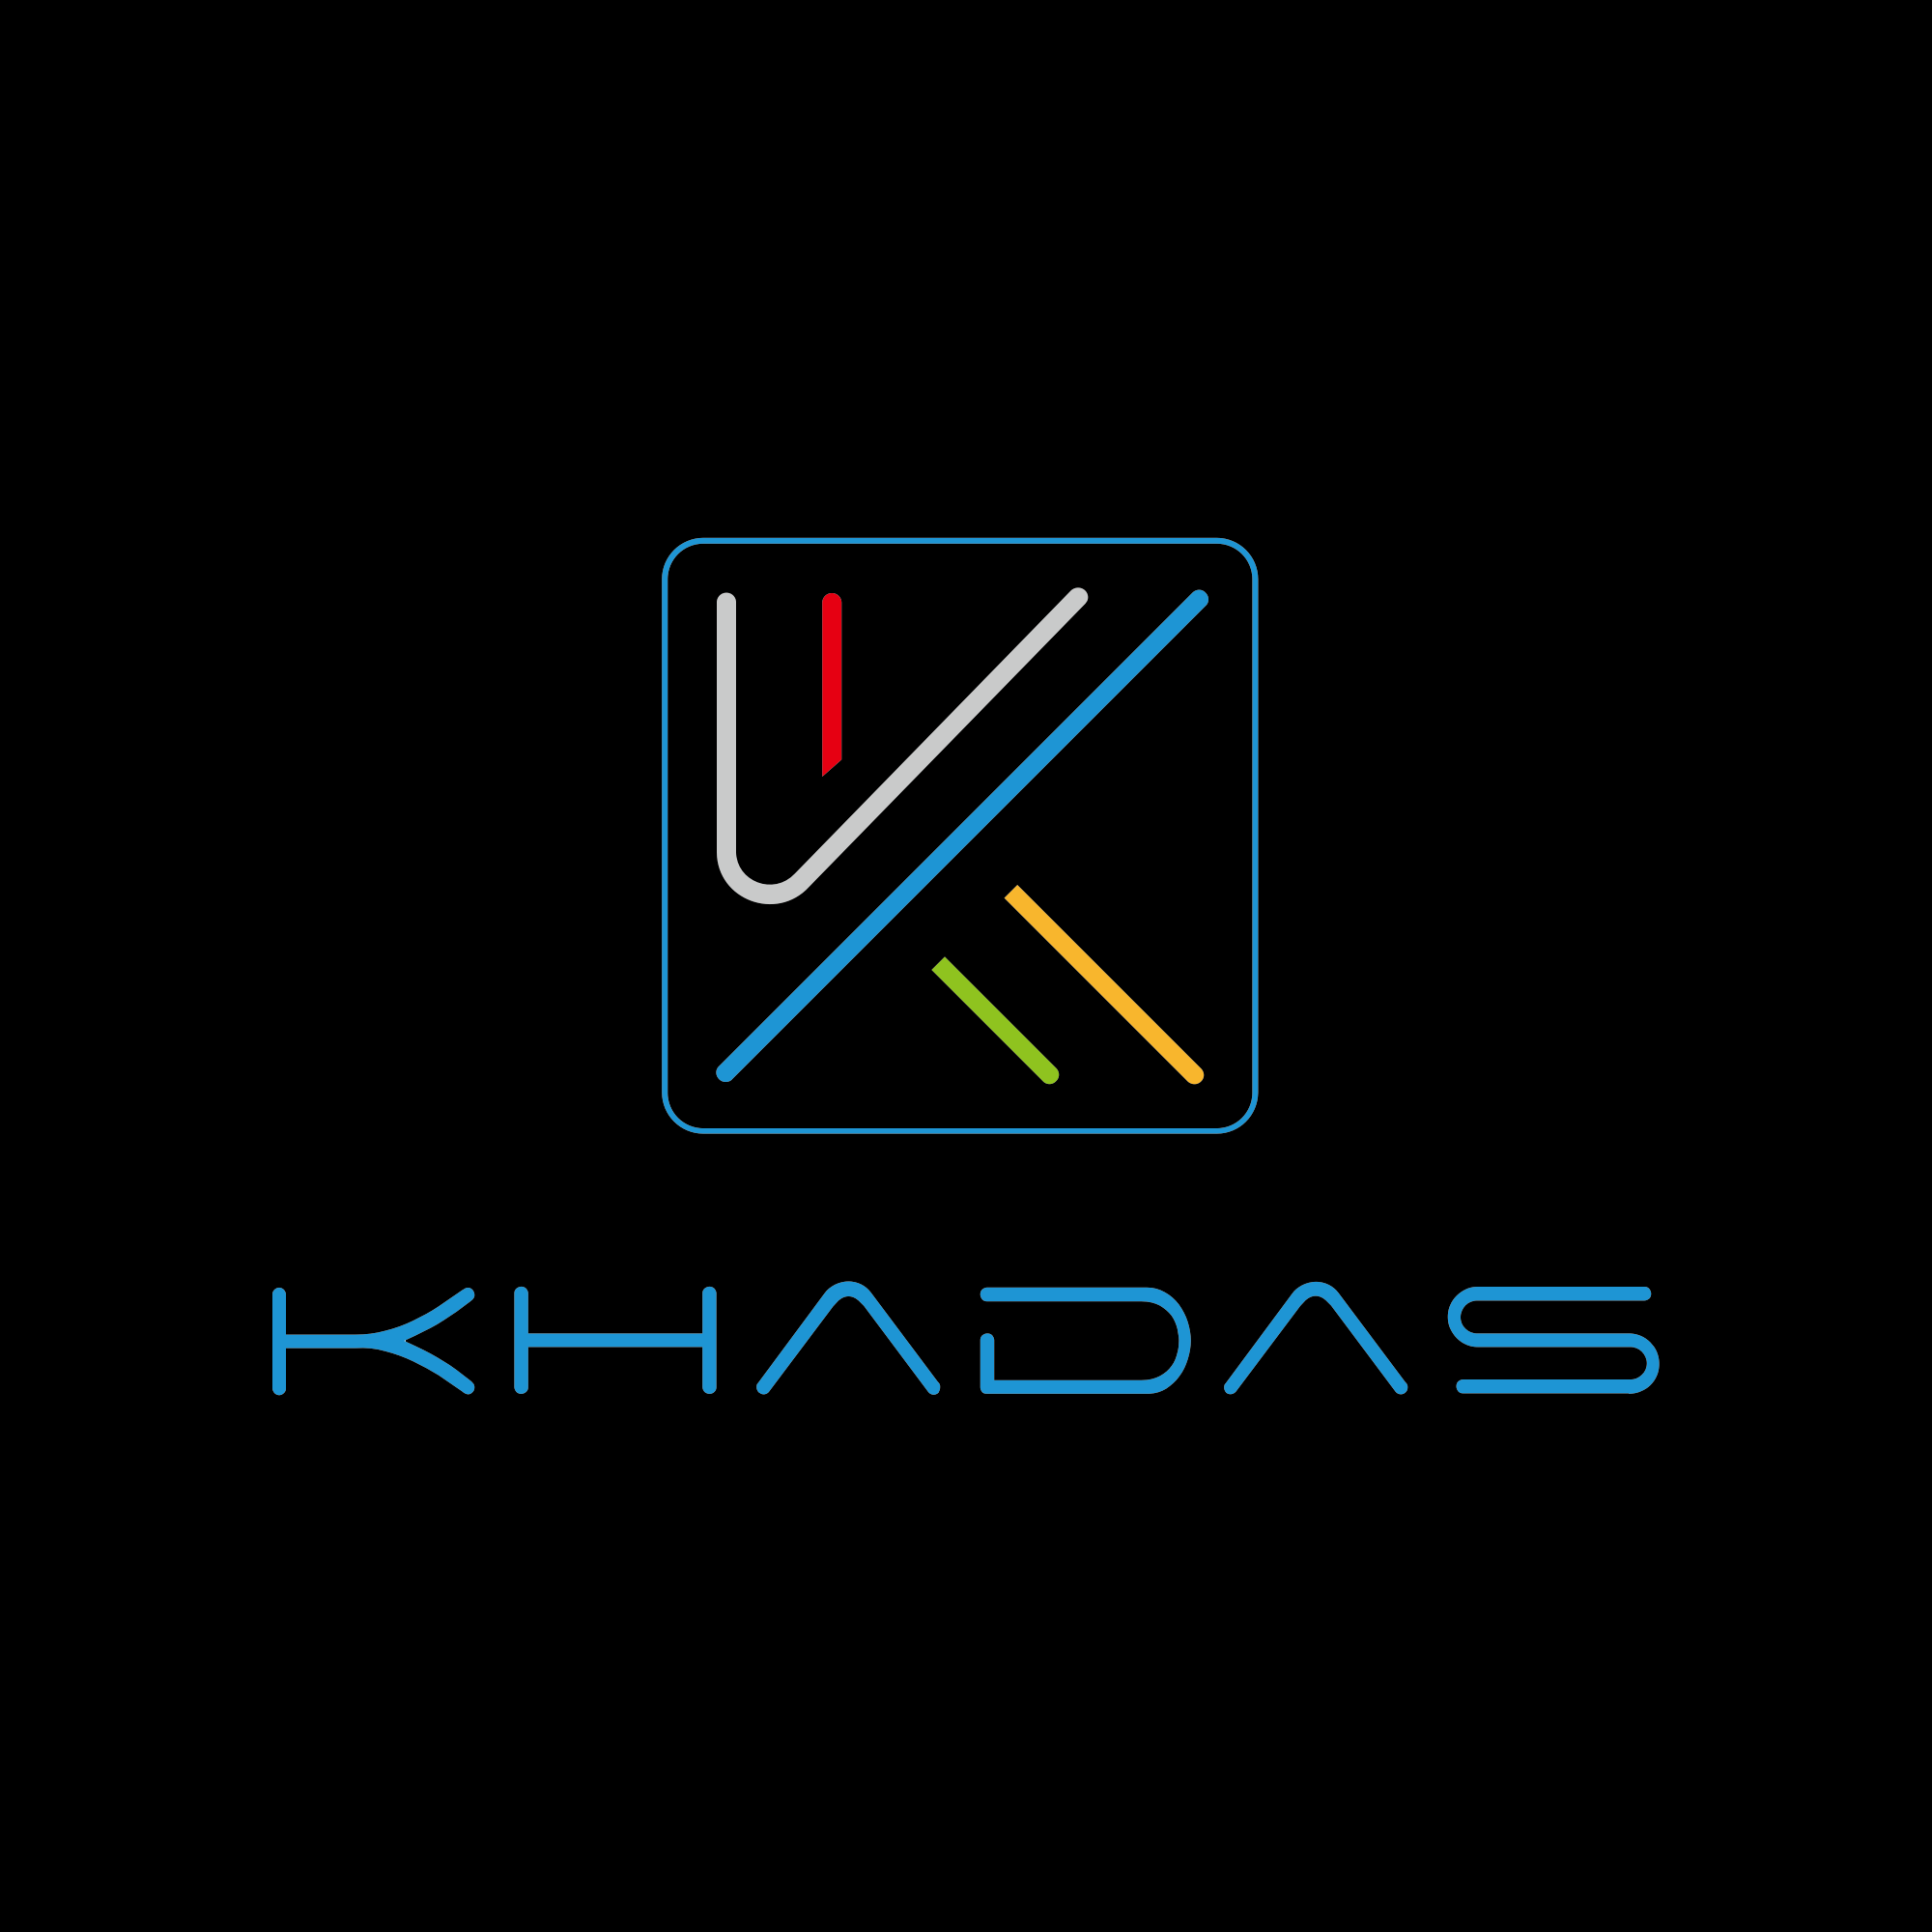 Khadas Edge (RK3399PRO & RK3399 SBC) Indiegogo Campaign Is